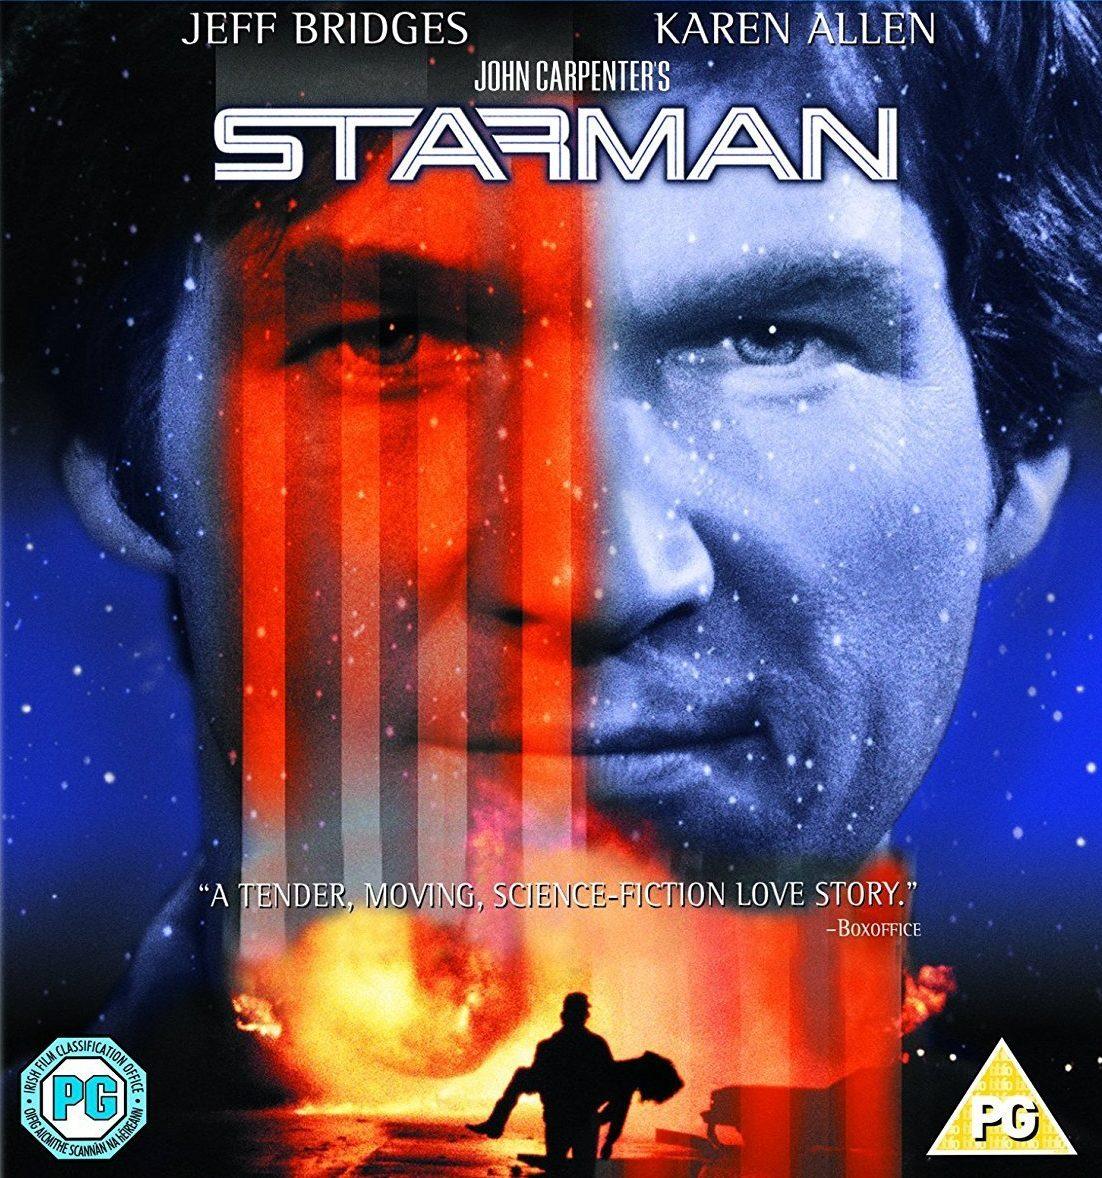 2L7pfRMJOiAooIupCPjsyD15zPKOiWJl e1580808449401 20 Interstellar Facts You Never Knew About Starman